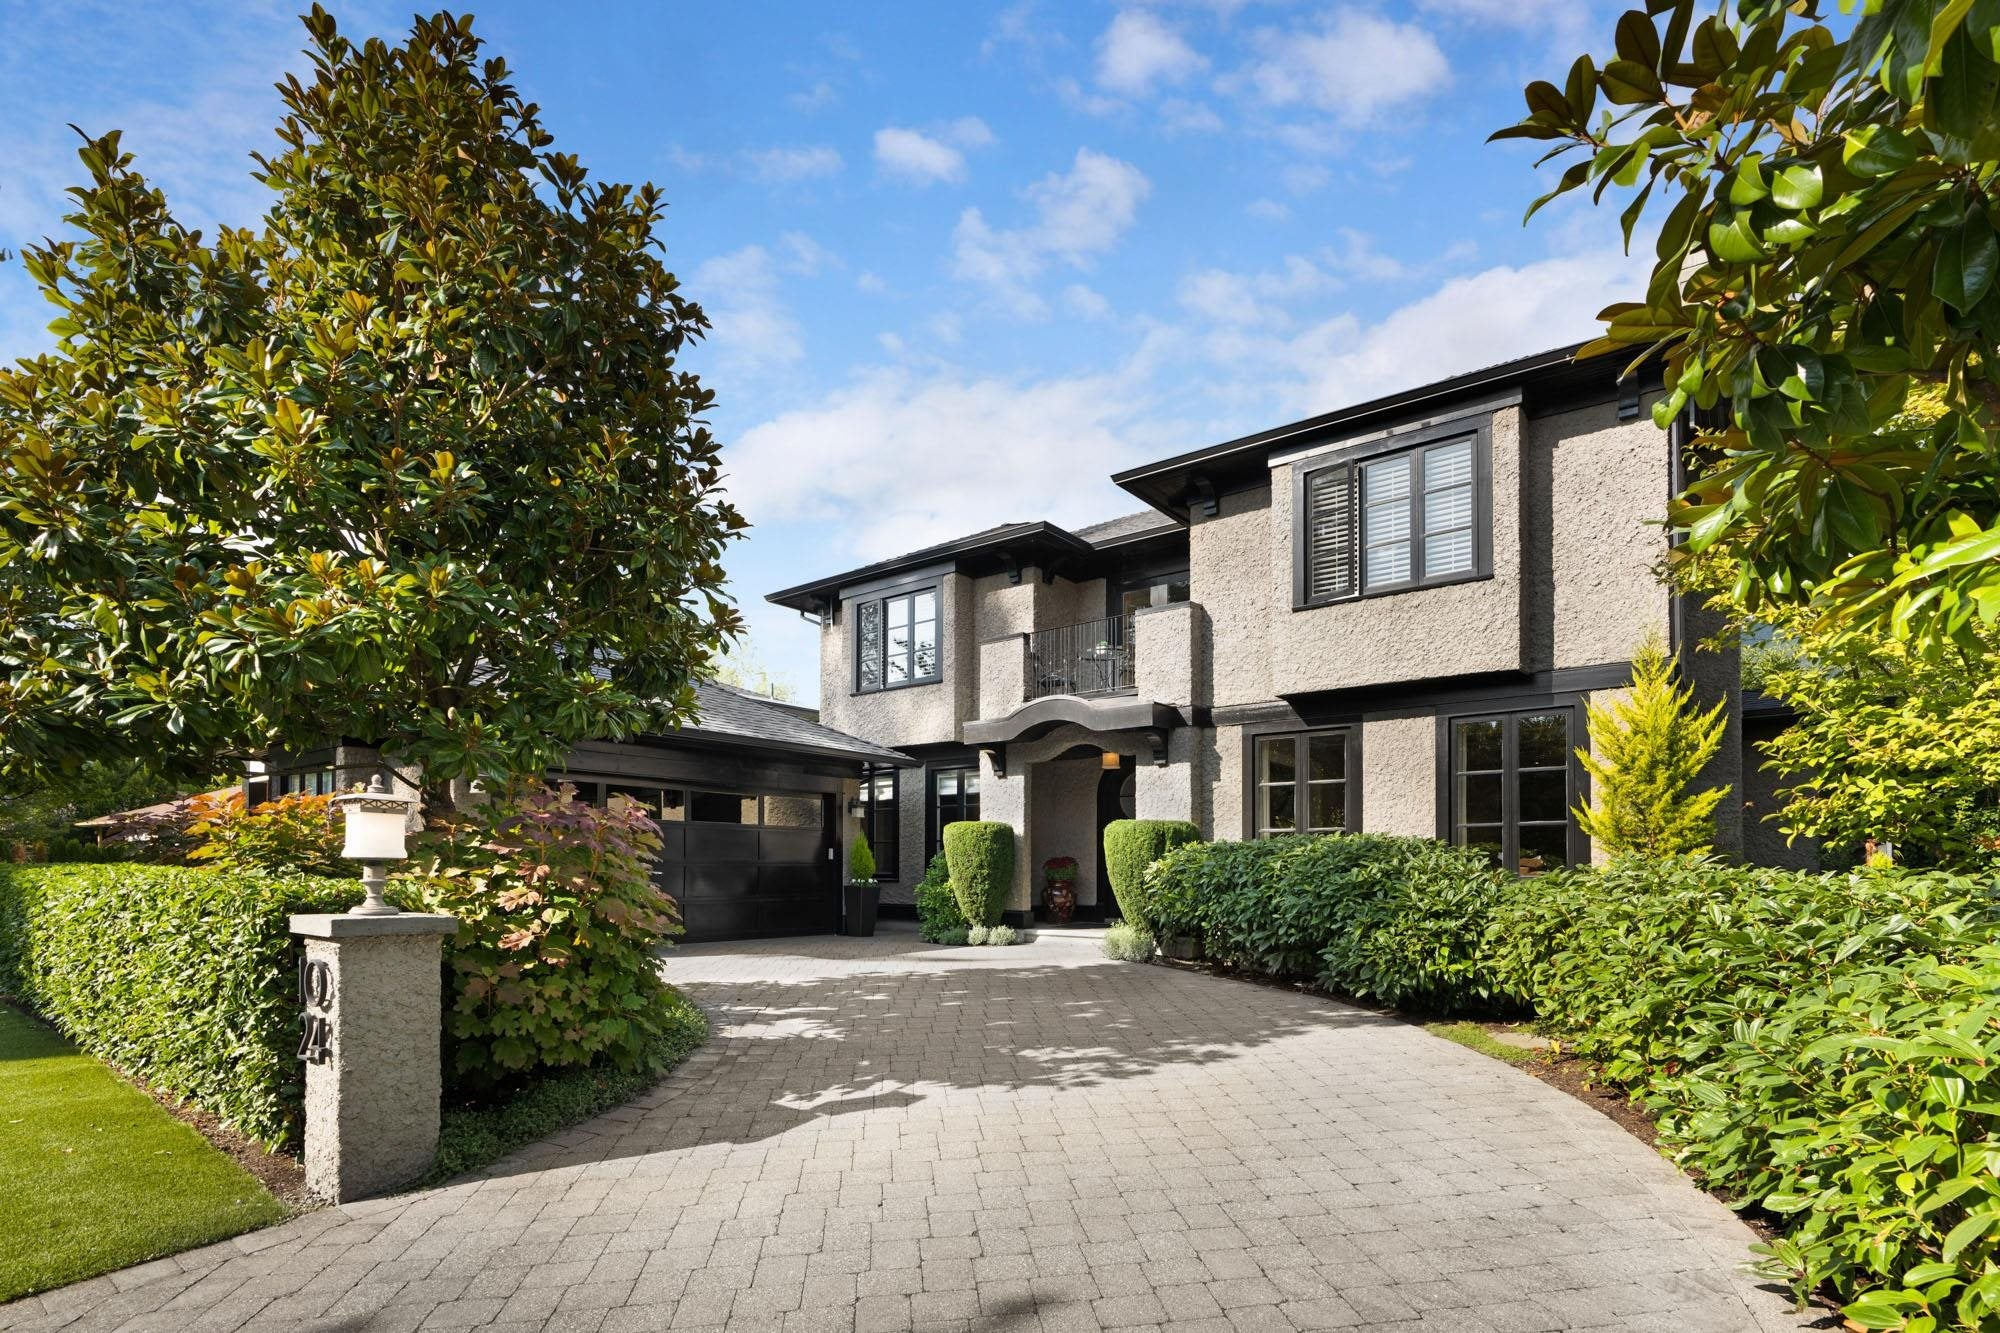 1024 BELMONT AVENUE - Edgemont House/Single Family for sale, 5 Bedrooms (R2616613) - #1